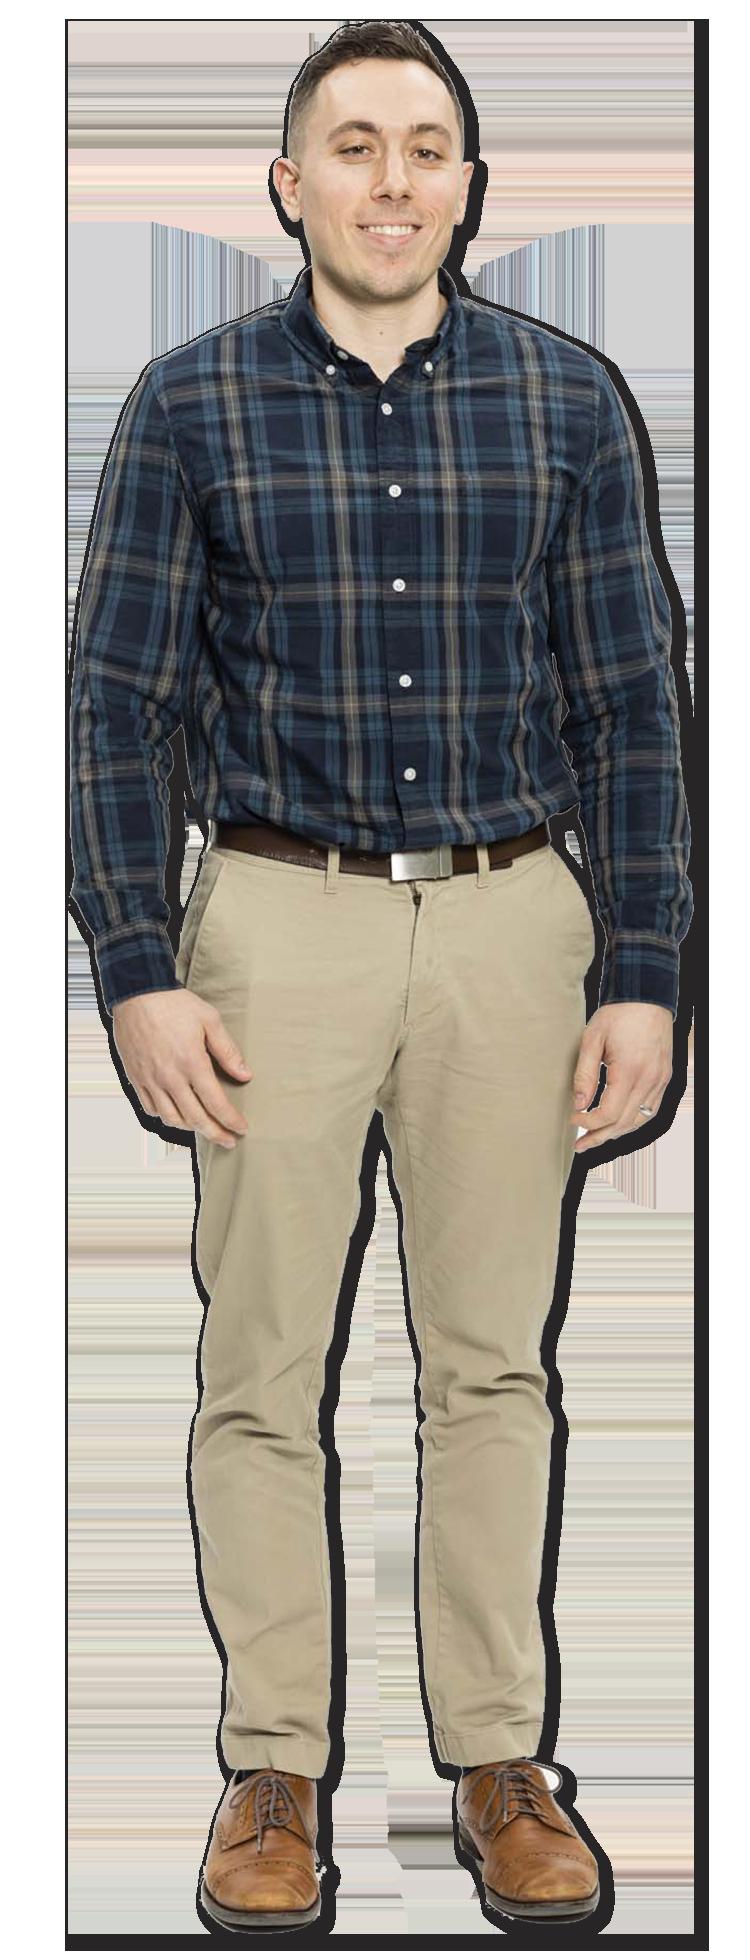 Vince Naviello VDC Manager